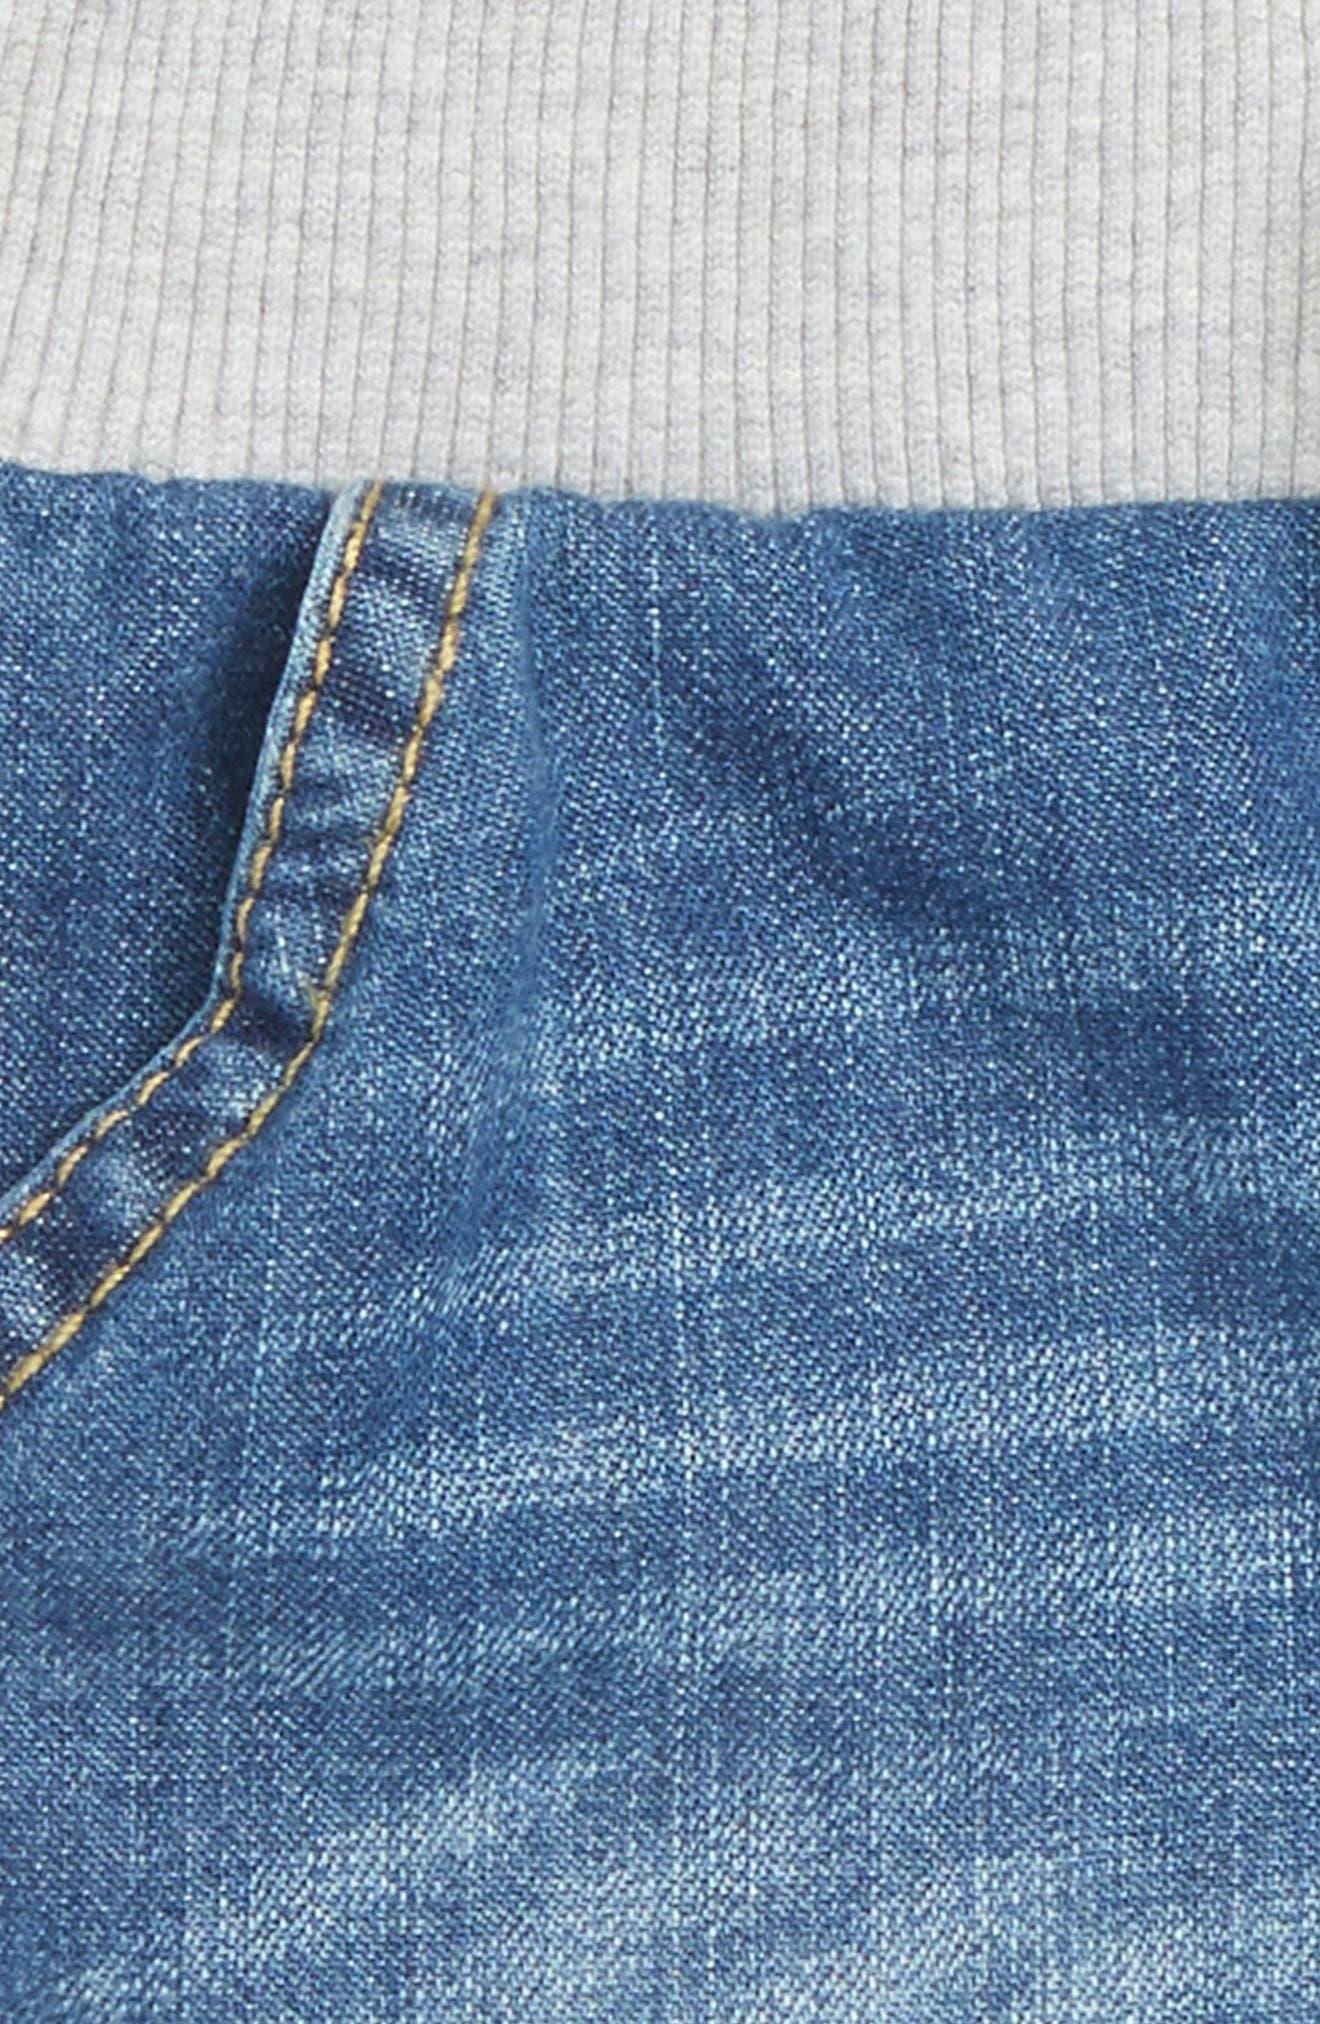 Woven Cotton Shorts,                             Alternate thumbnail 2, color,                             420